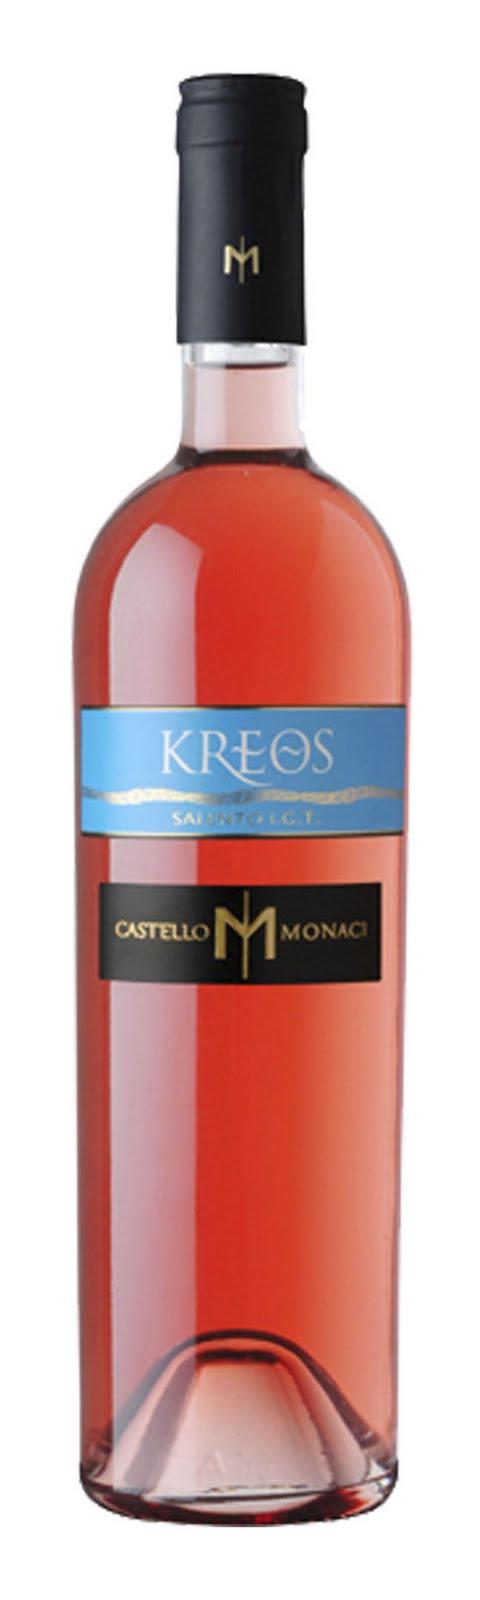 Tasteful Tannins -  Castello Monaci Kreos Rosato Salento